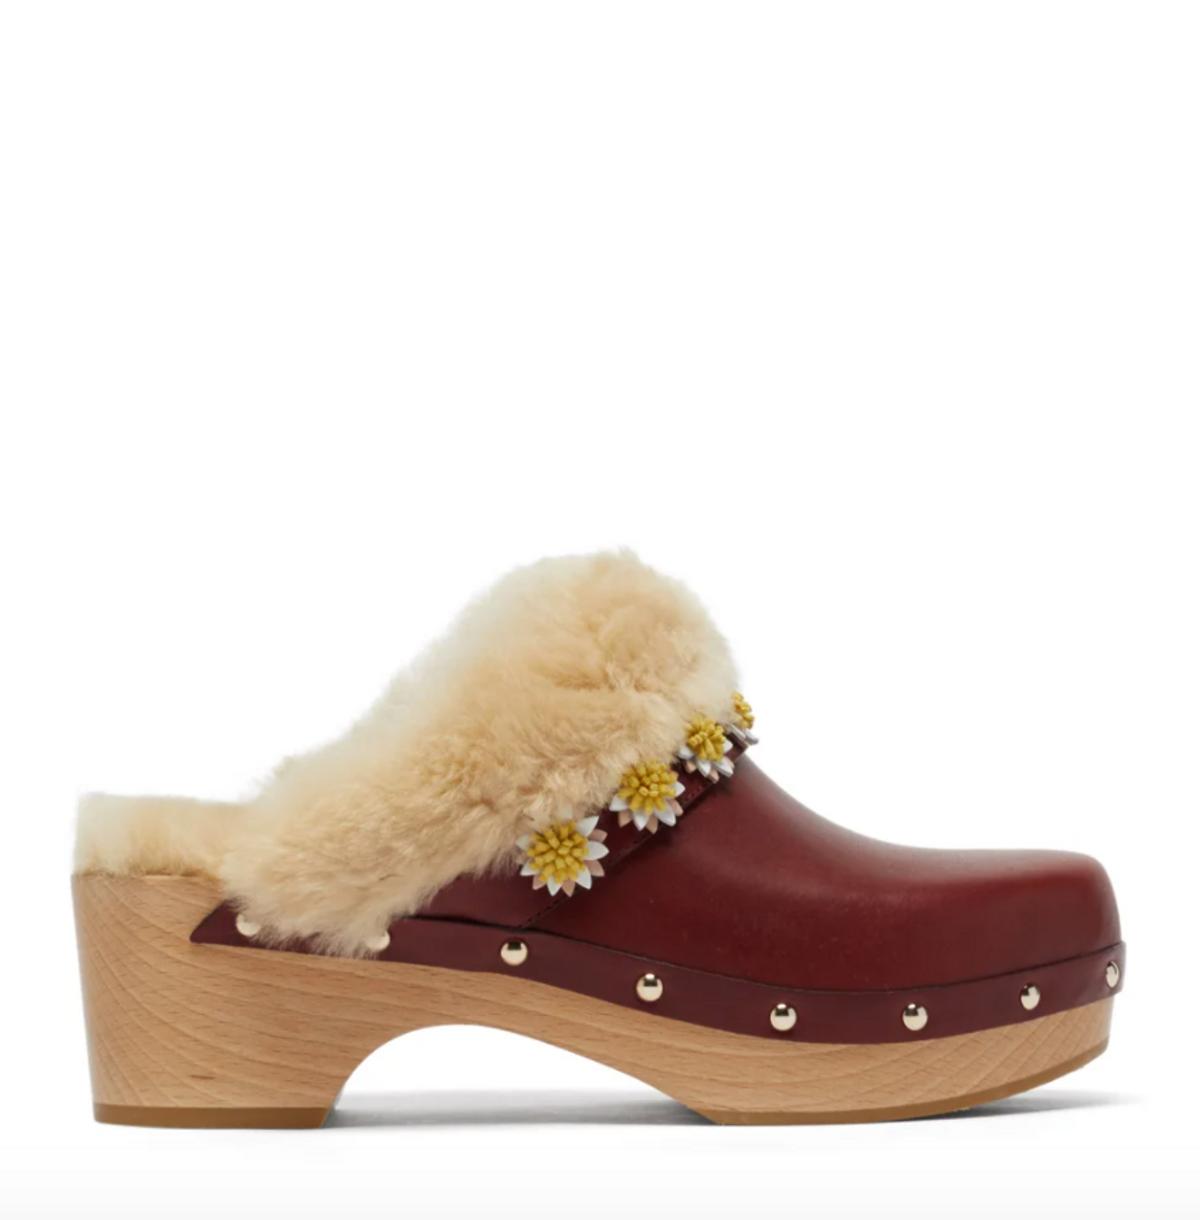 fabrizio vitti jean shearling lined leather clogs